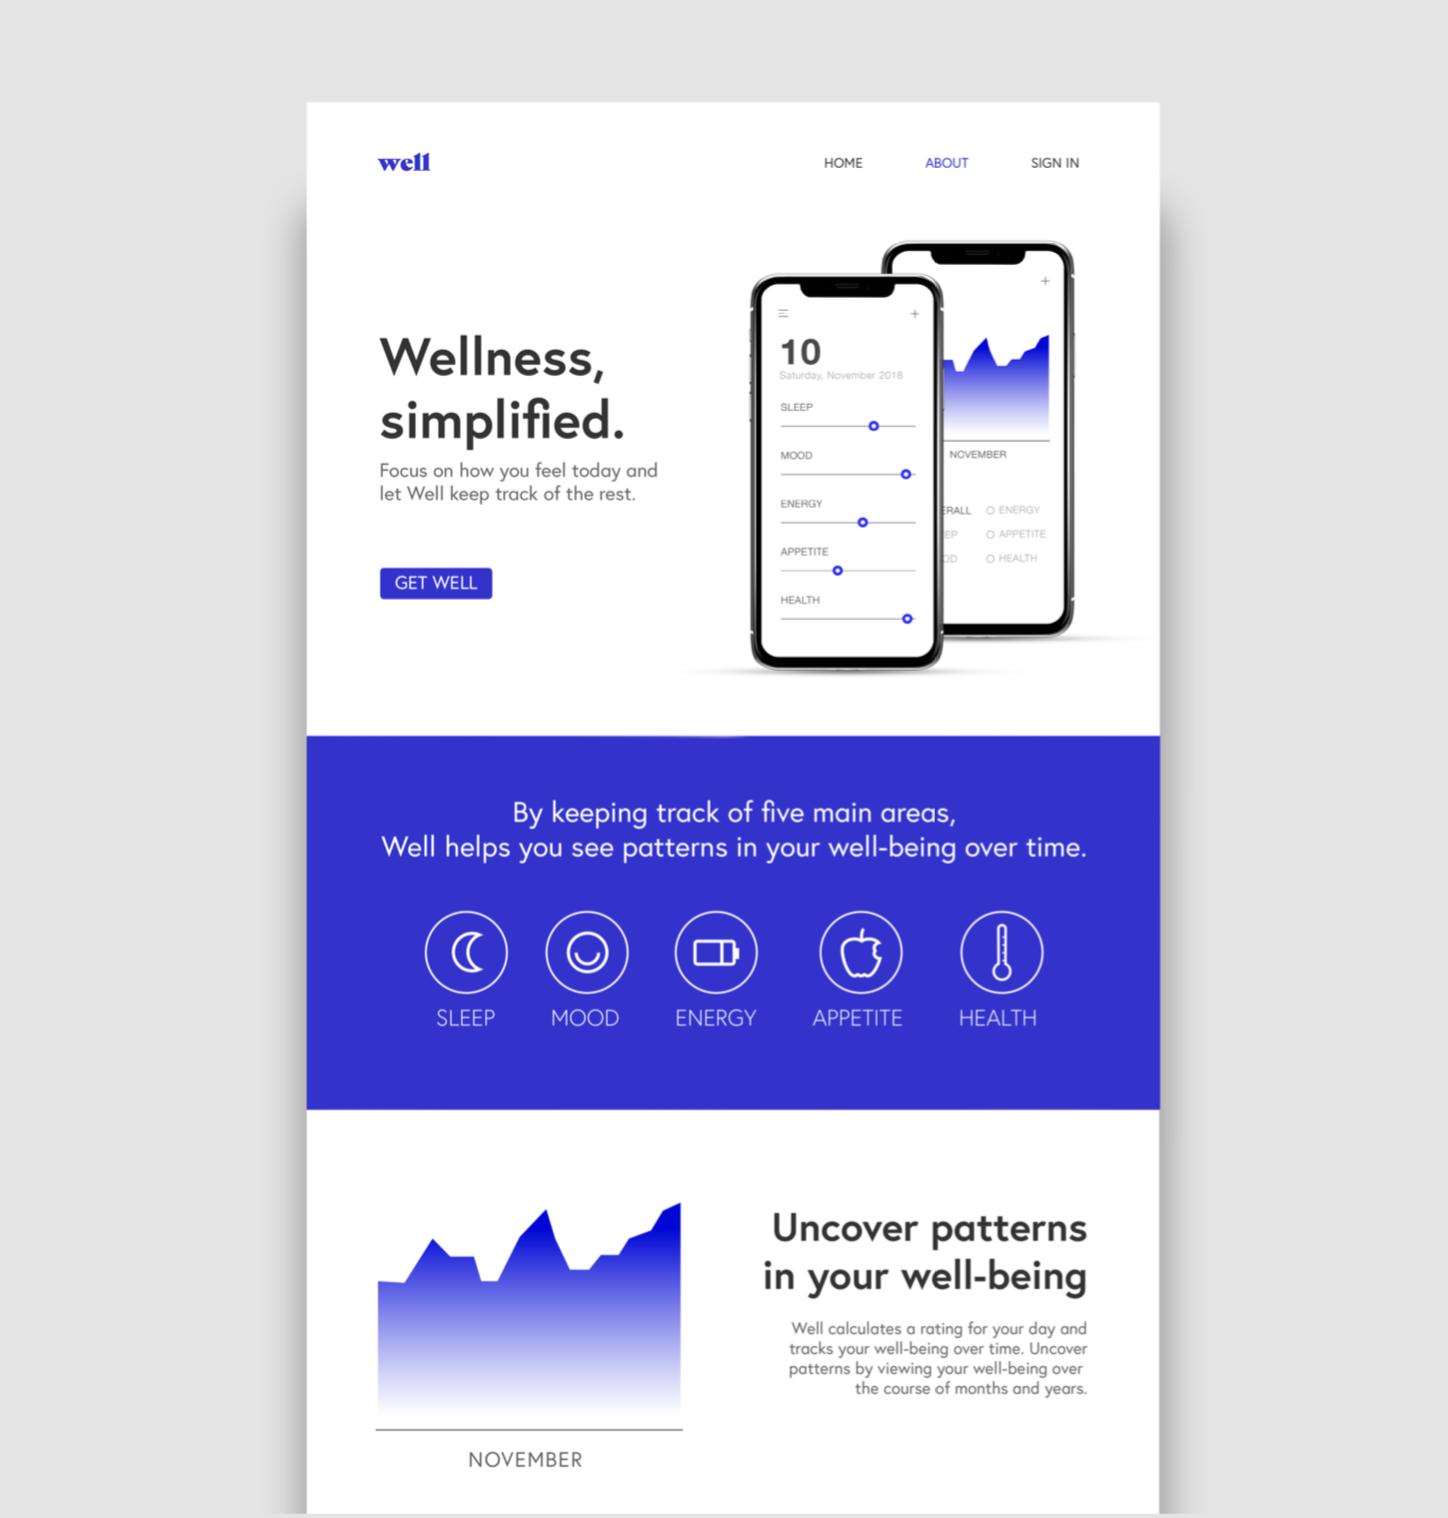 App design by student Megan Calvin